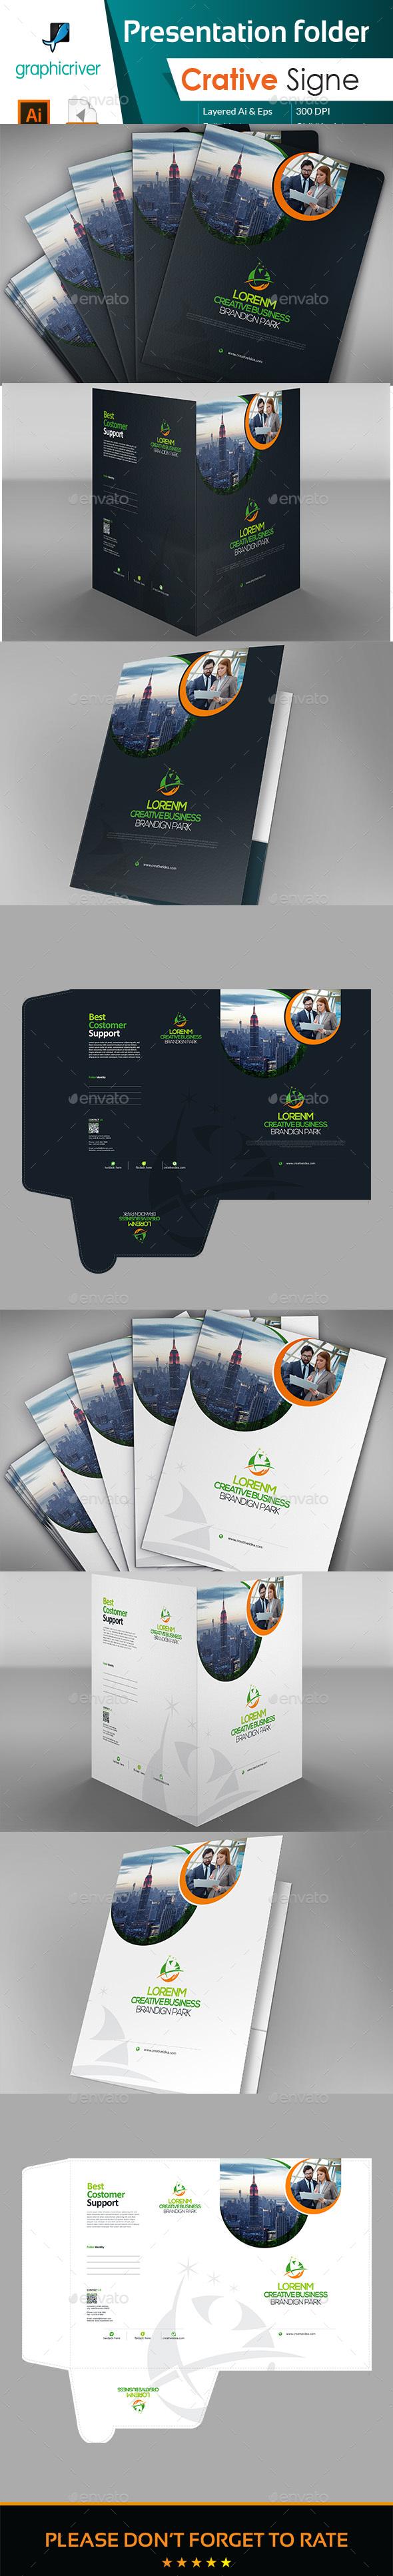 Corporate Folder Presentation - Stationery Print Templates